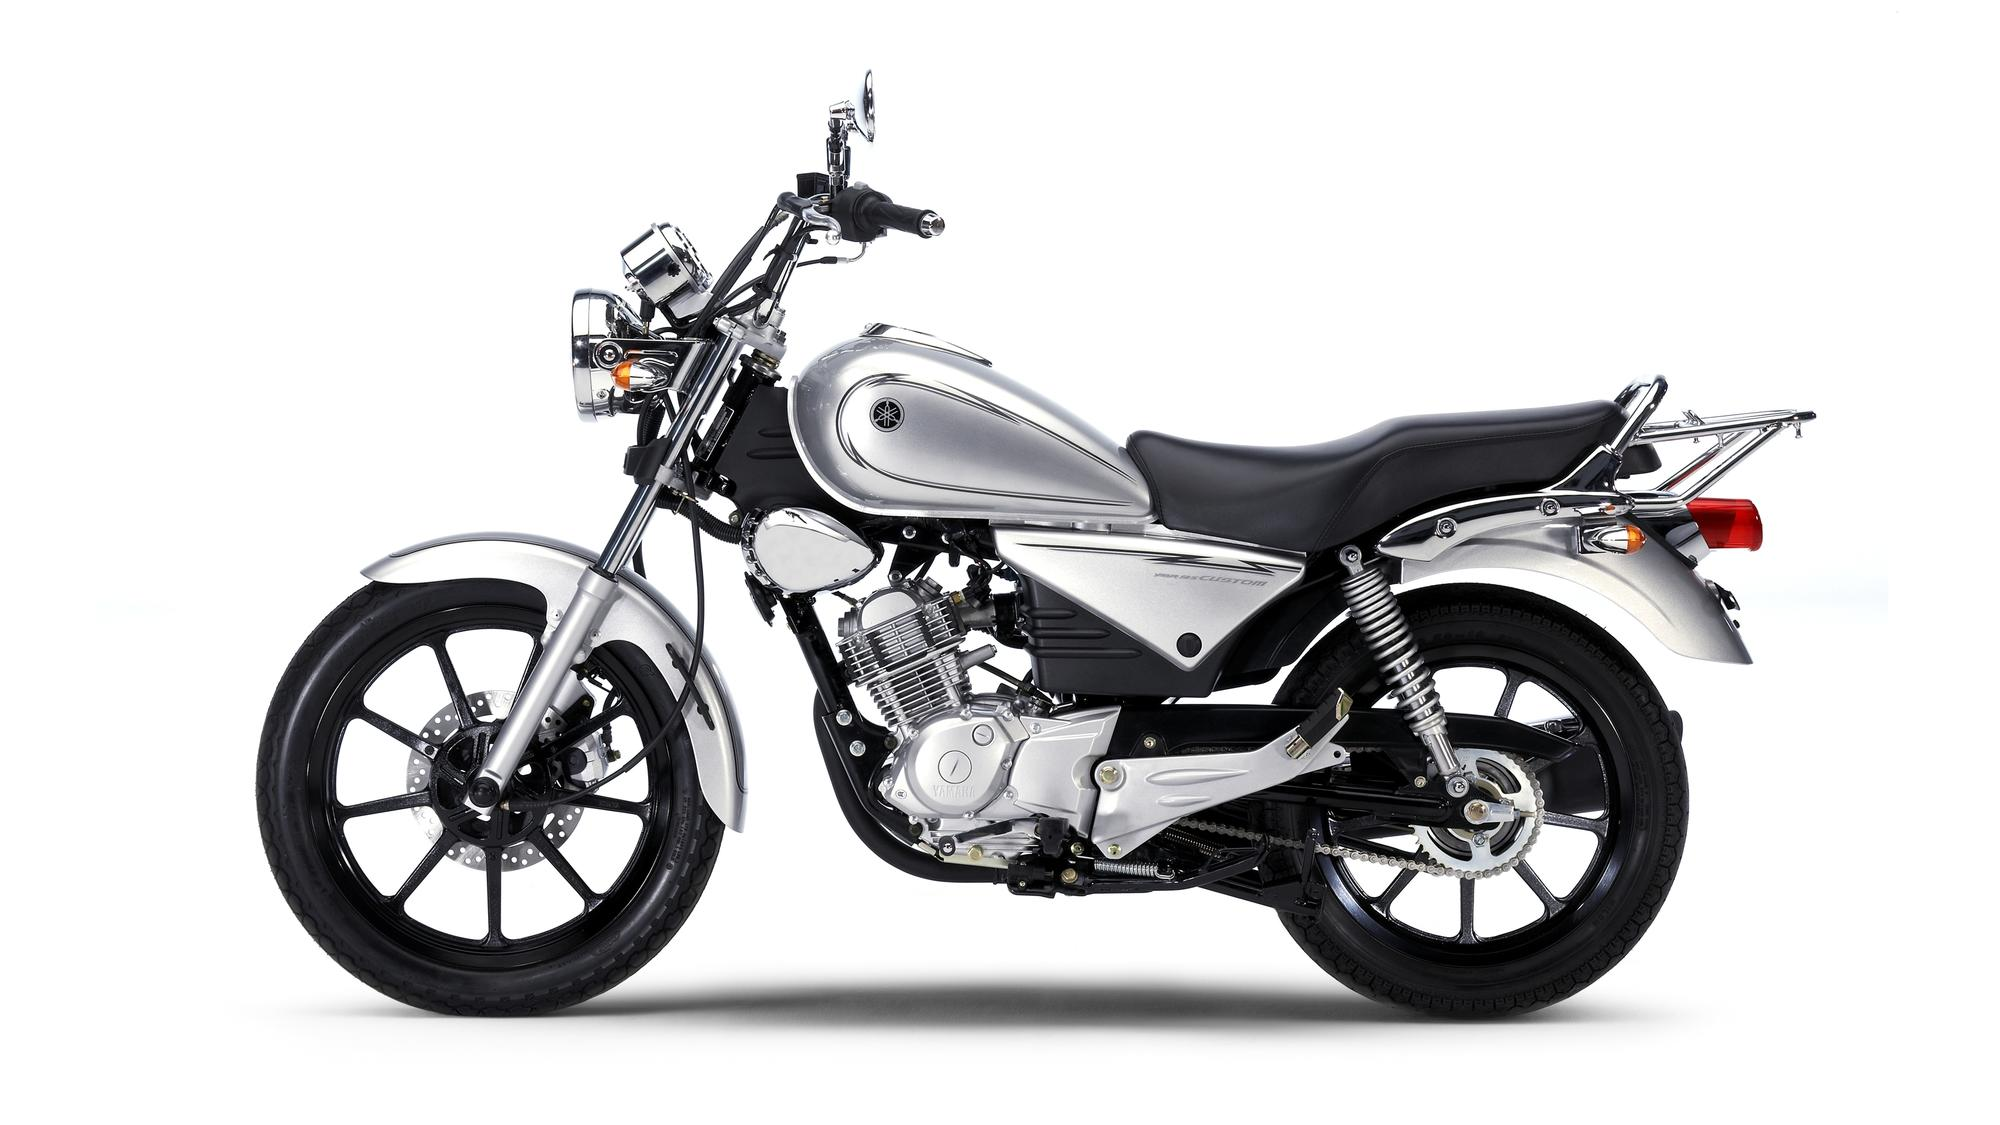 Yamaha YBR125 Custom • Review • For Sale • Price Guide • The Bike Market